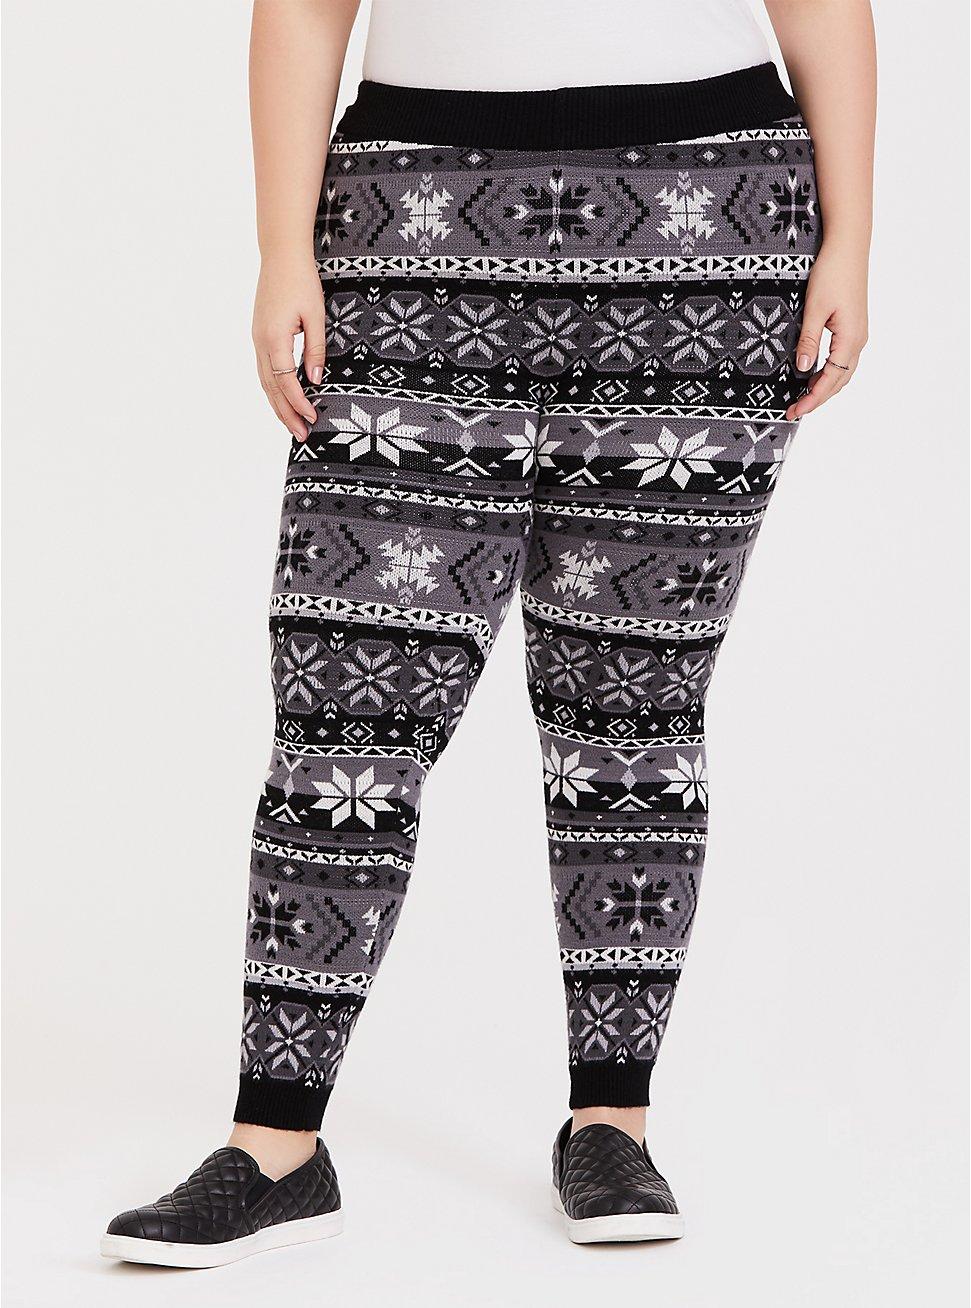 Sweater-Knit Legging - Fair Isle Black & White, MULTI, hi-res